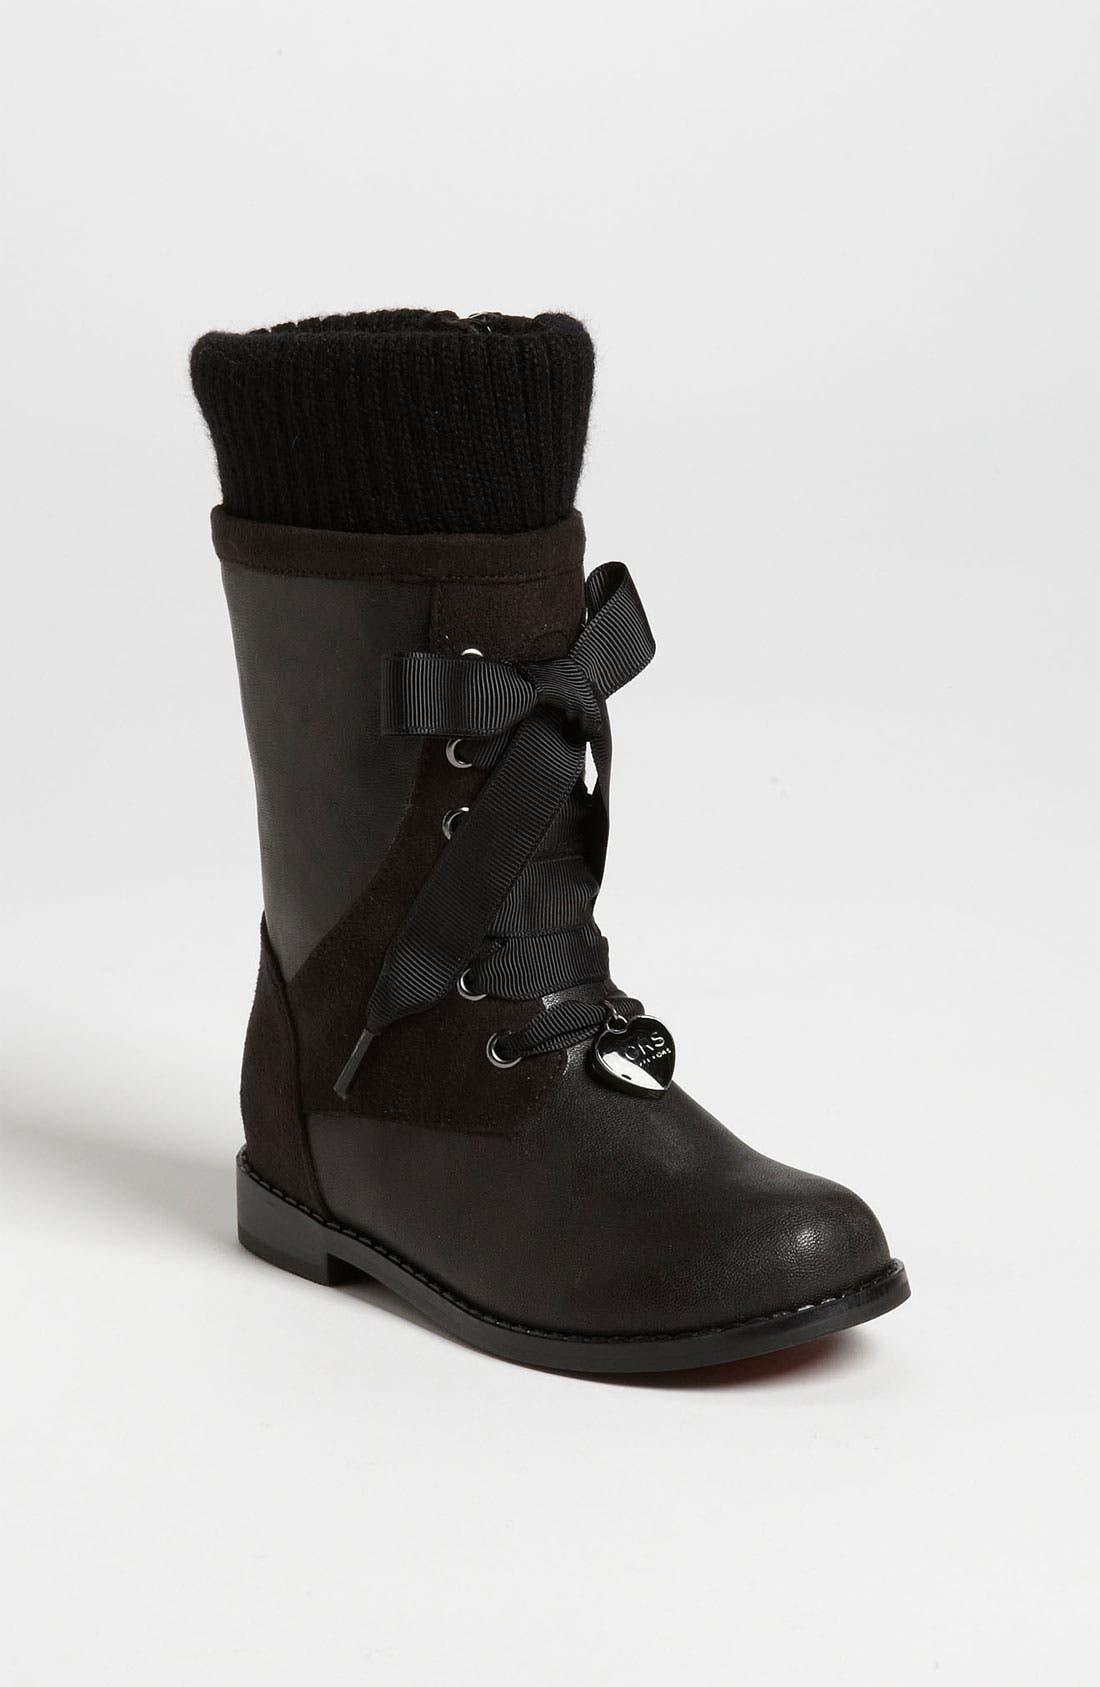 Main Image - KORS Michael Kors 'Bambi' Boot (Toddler)